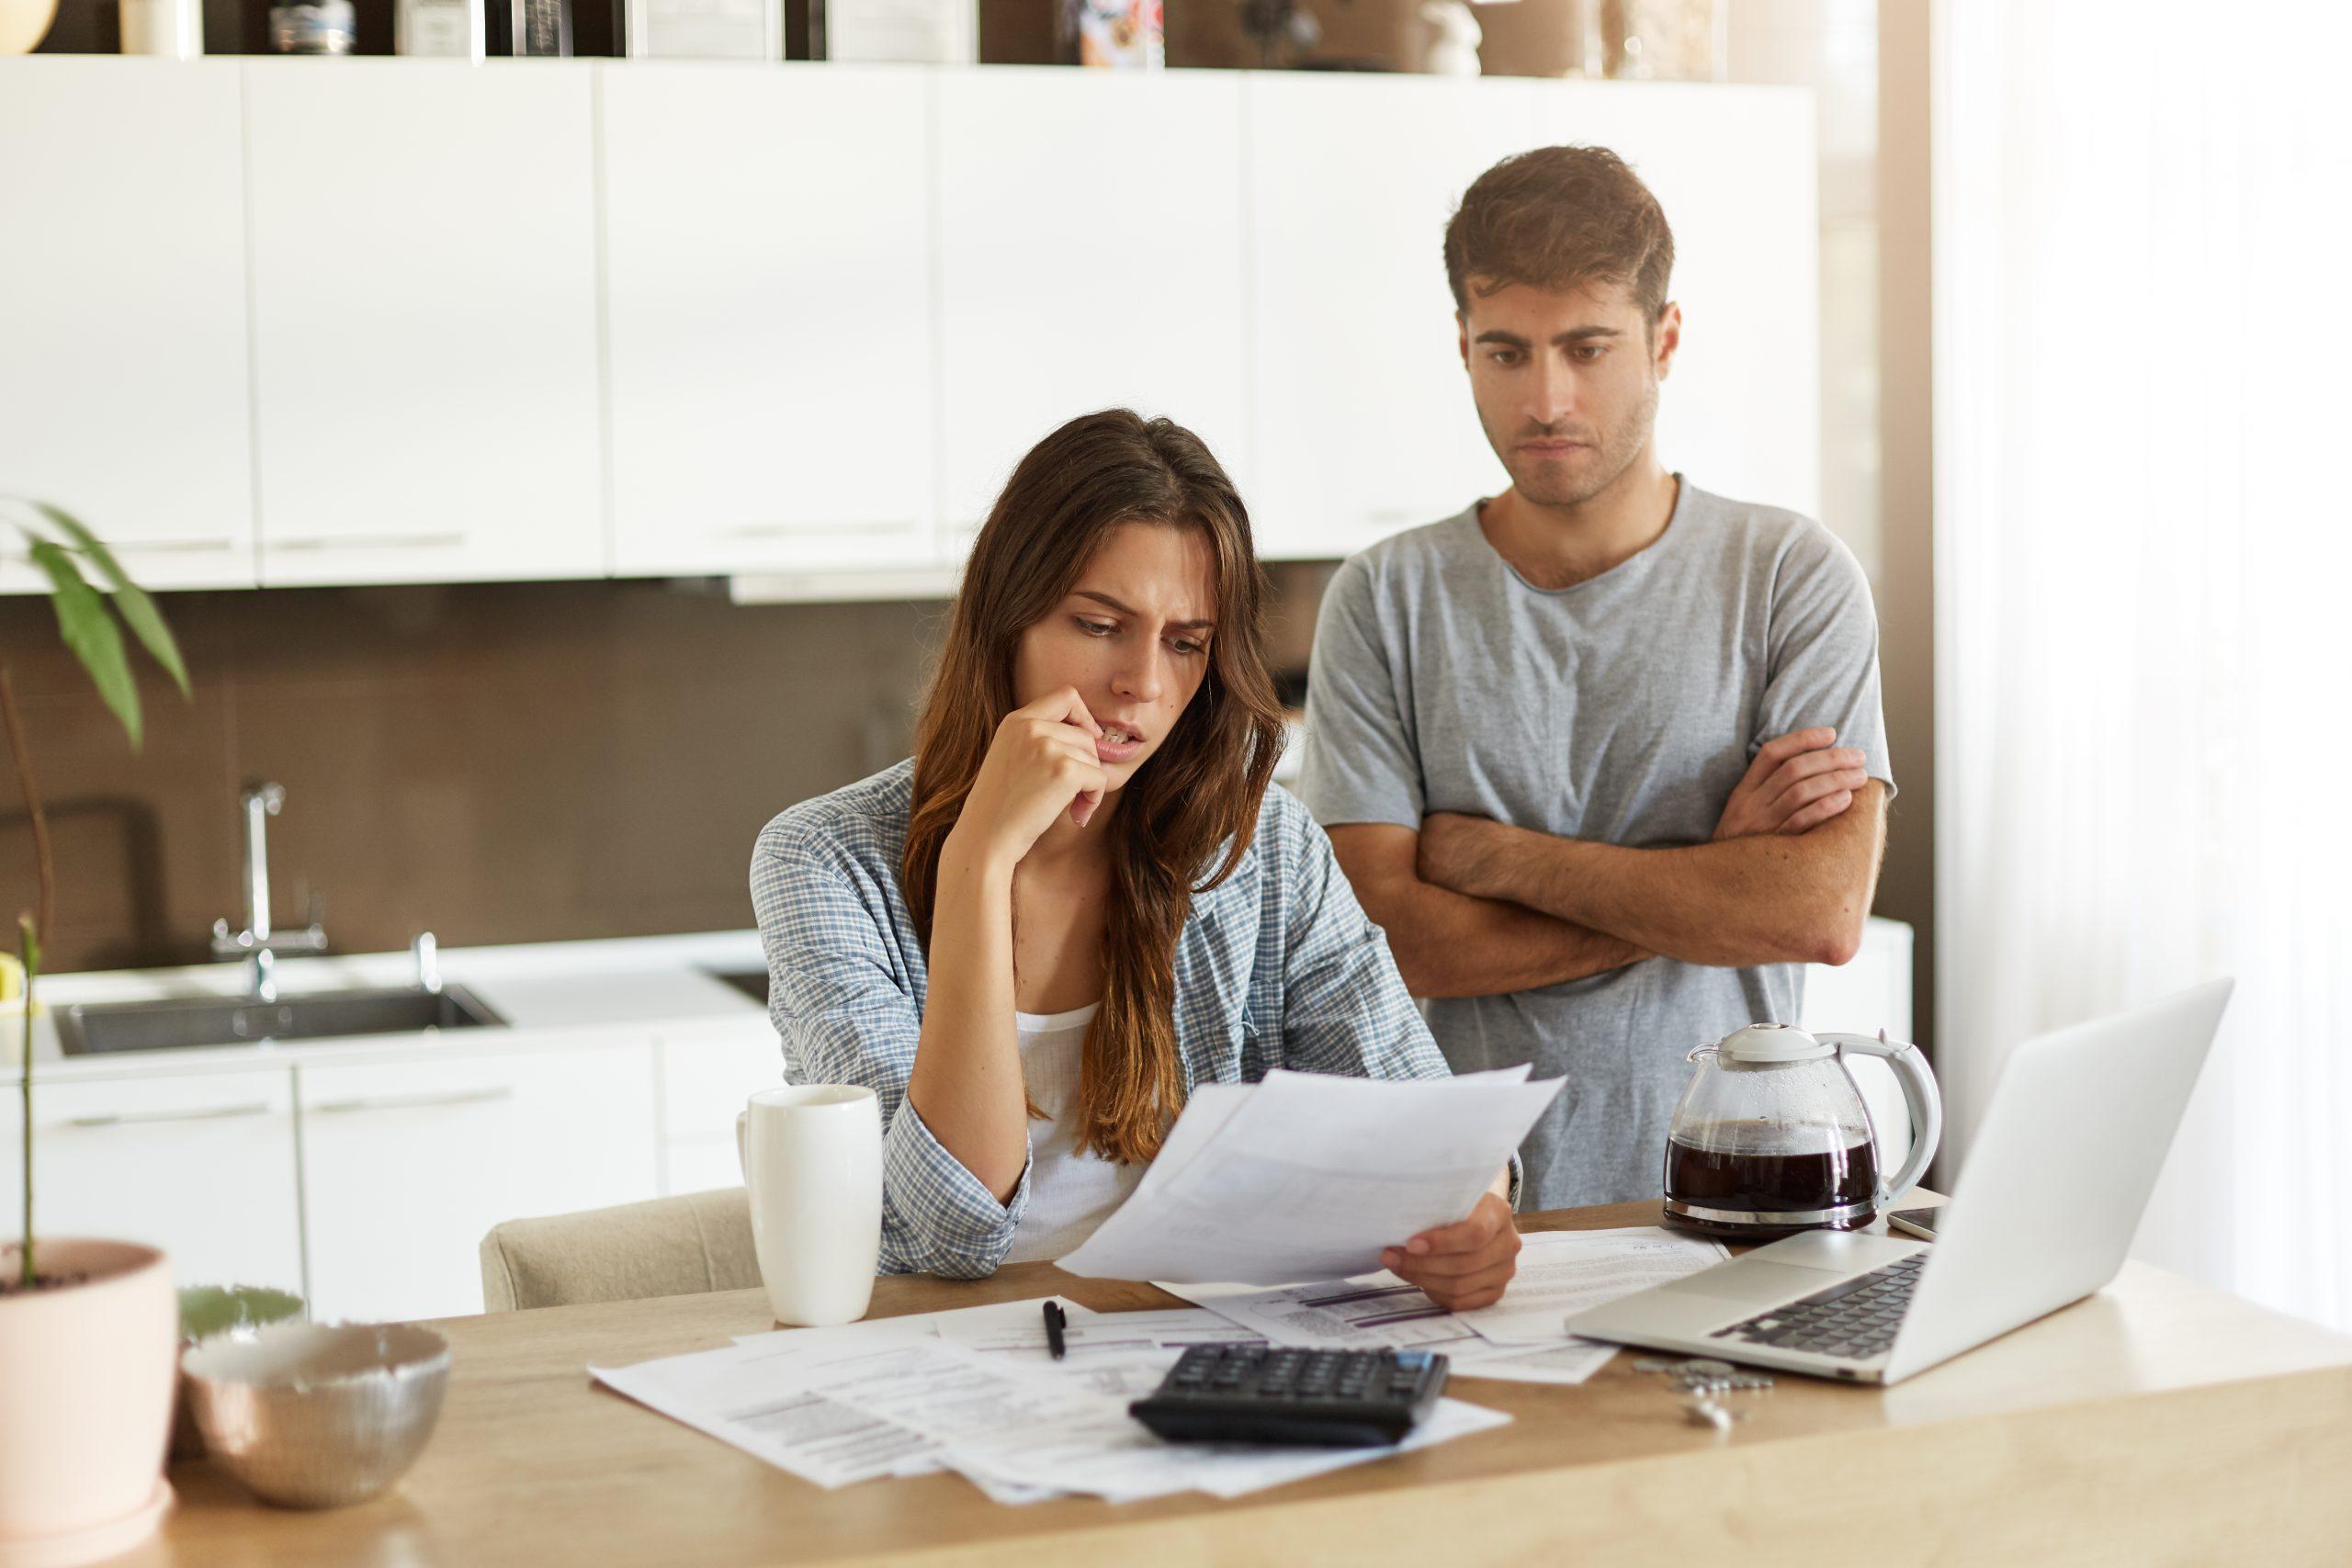 6 Ways to Cut your Utility Bills